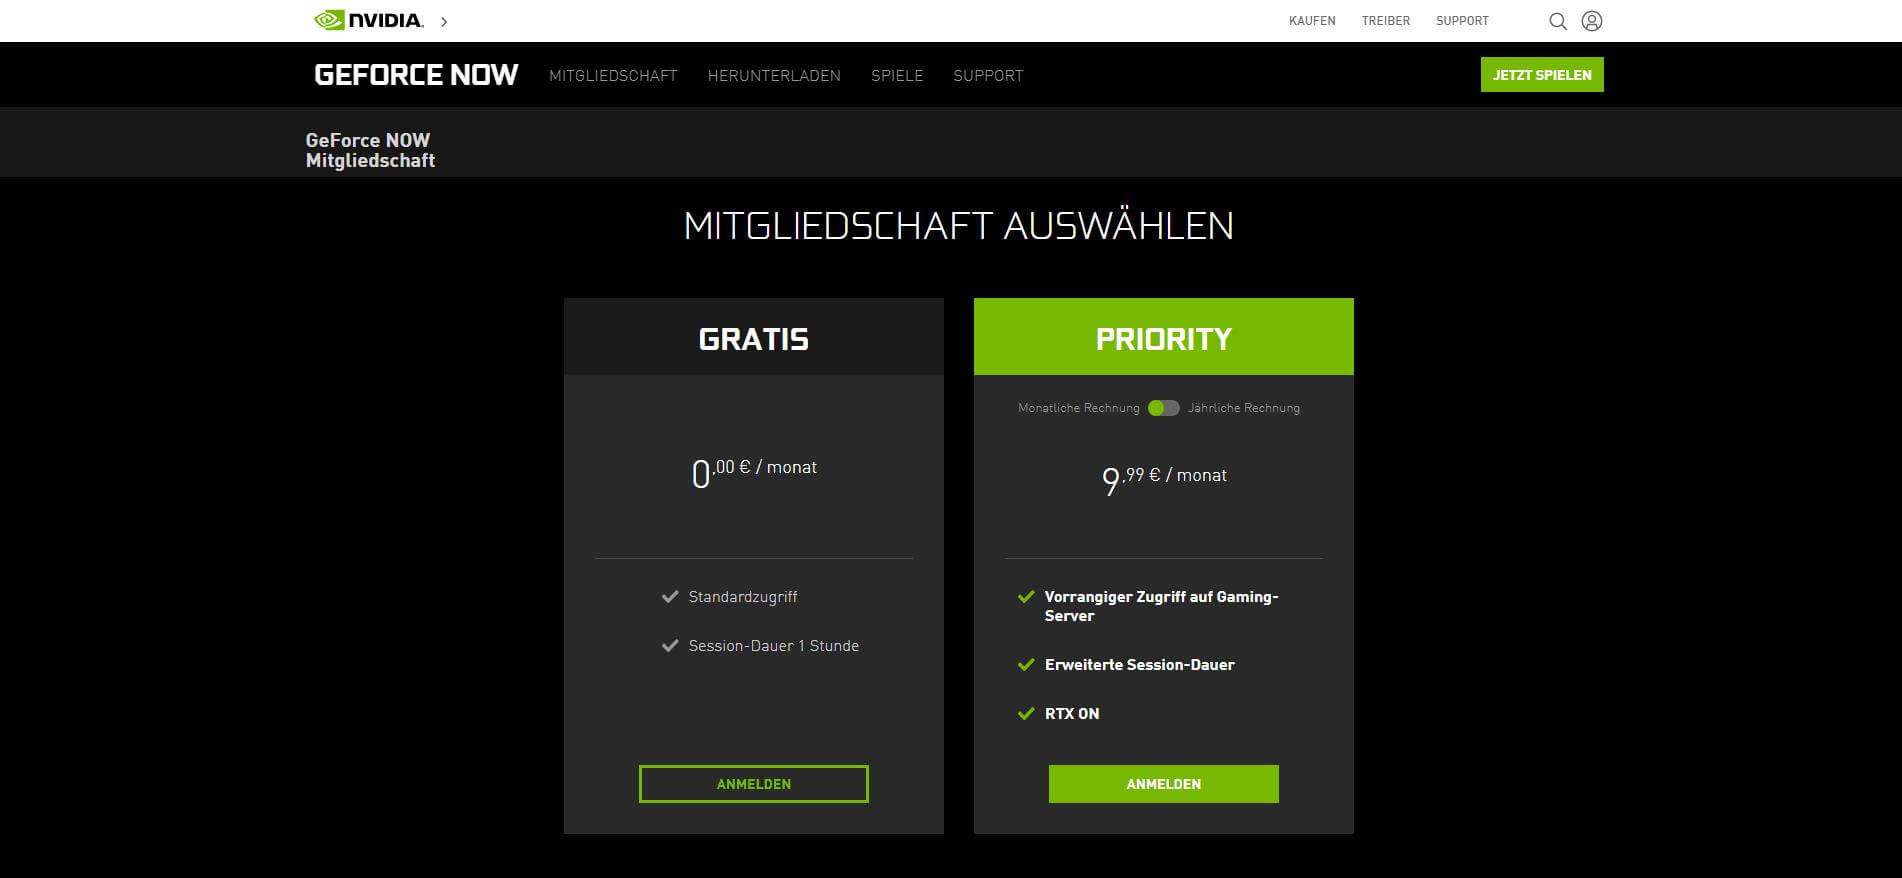 NVIDIA GeForce NowMitgliedschaften